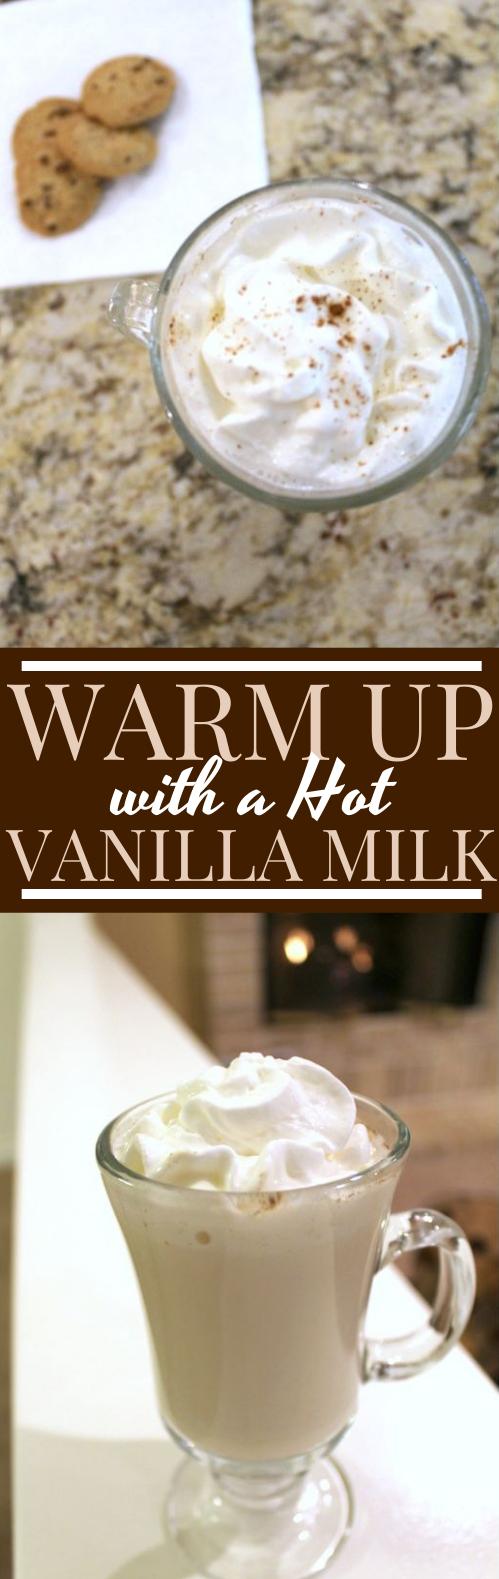 Hot Vanilla Milk #drinks #milk #hot #beverages #winter